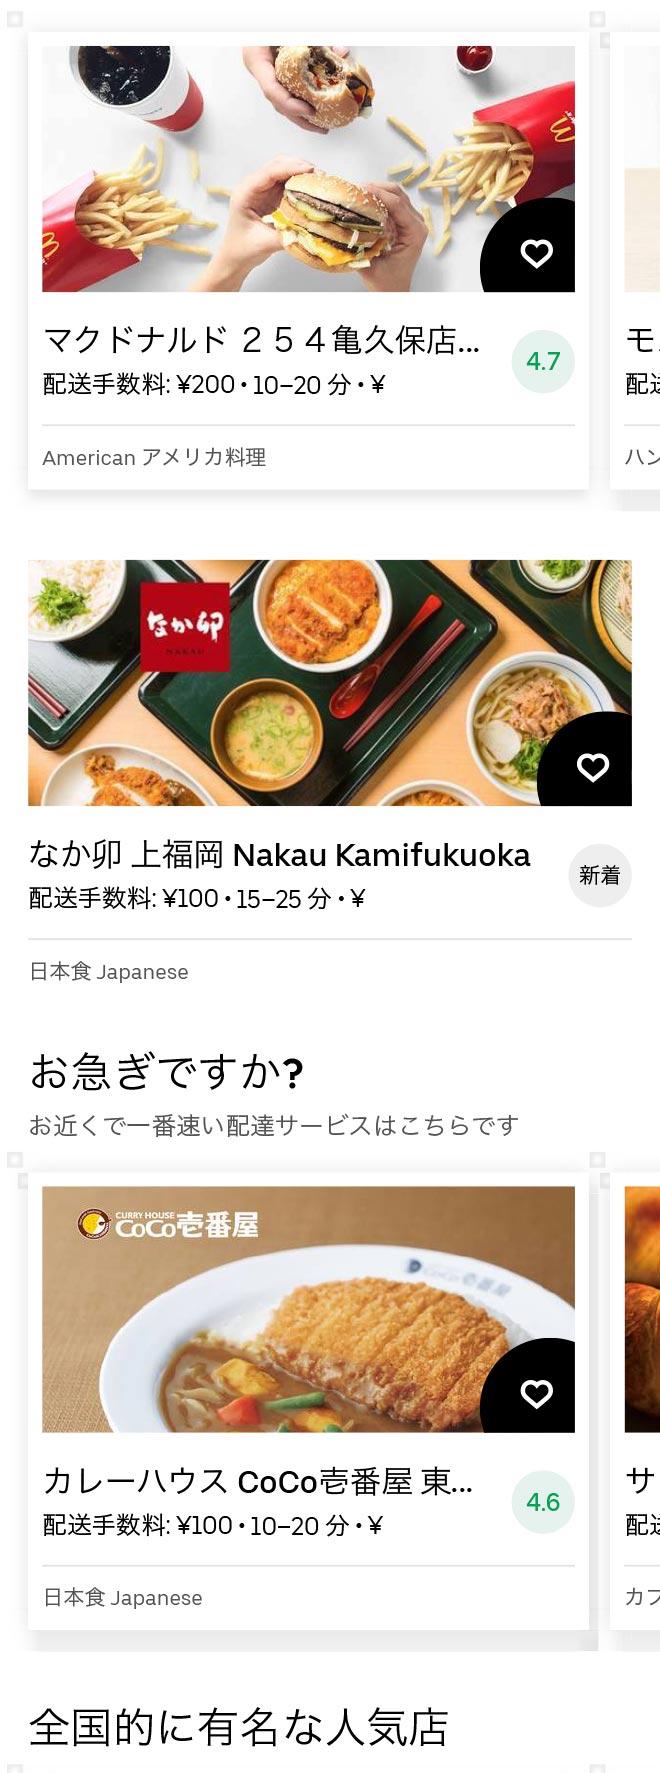 Kamifukuoka menu 2011 01